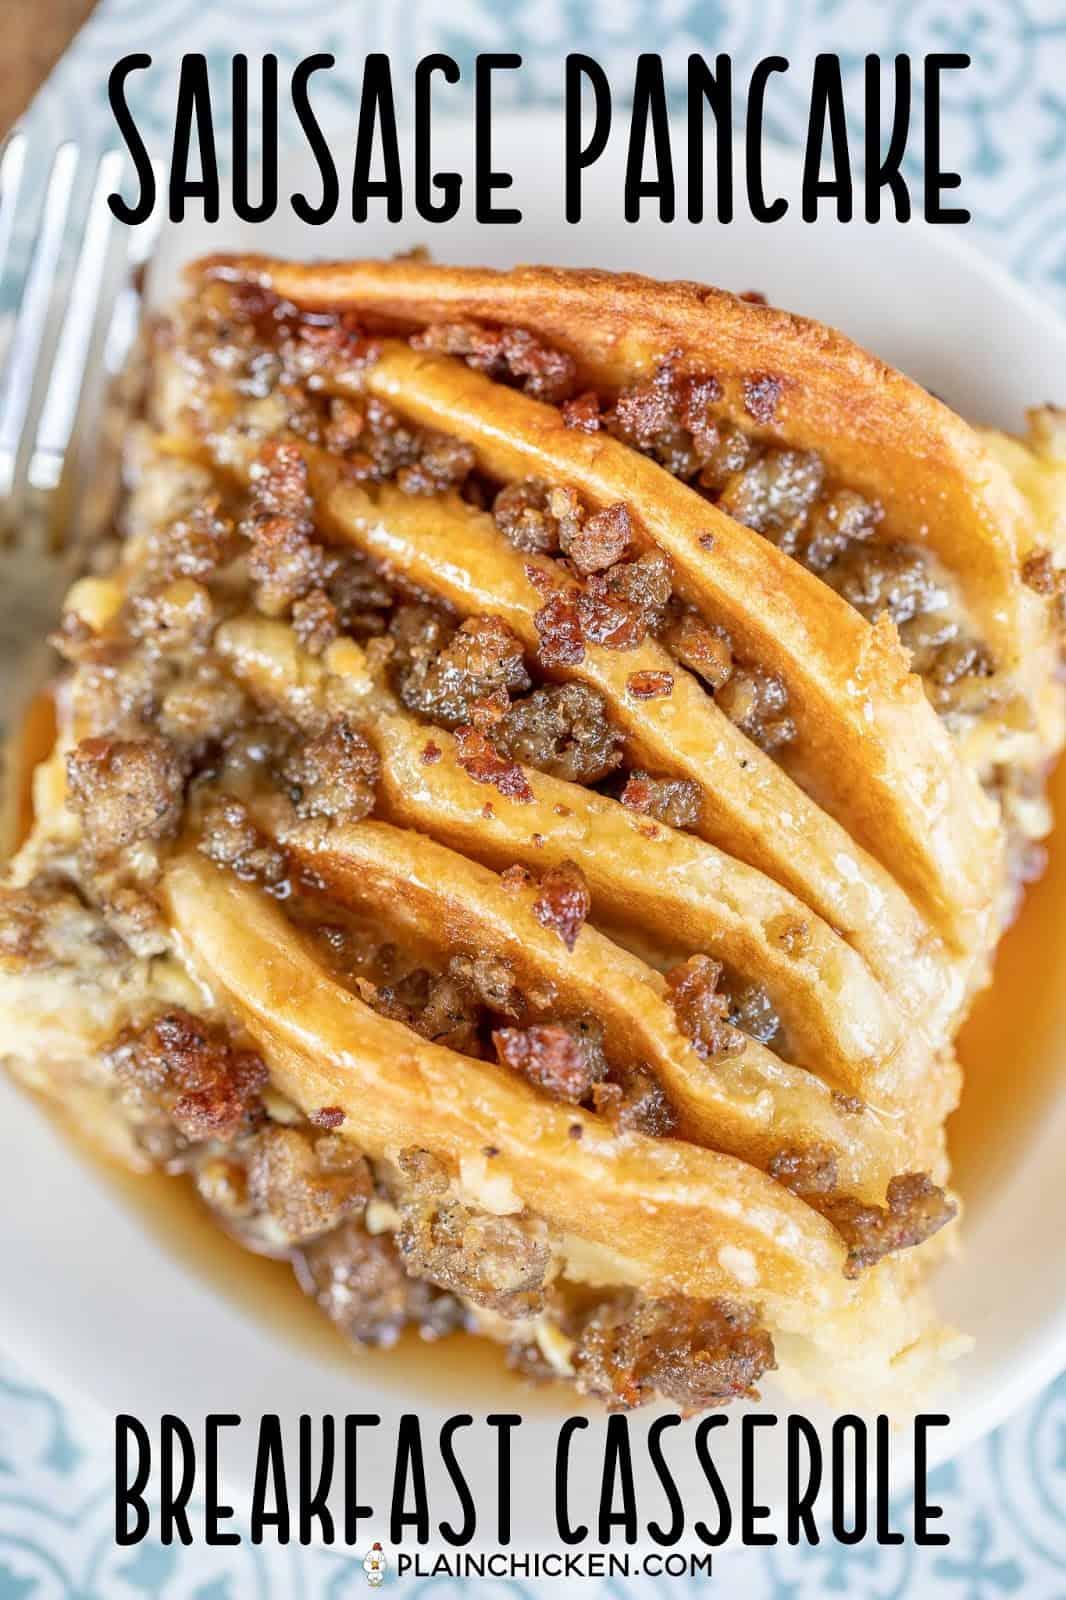 sausage pancake breakfast casserole on a plate